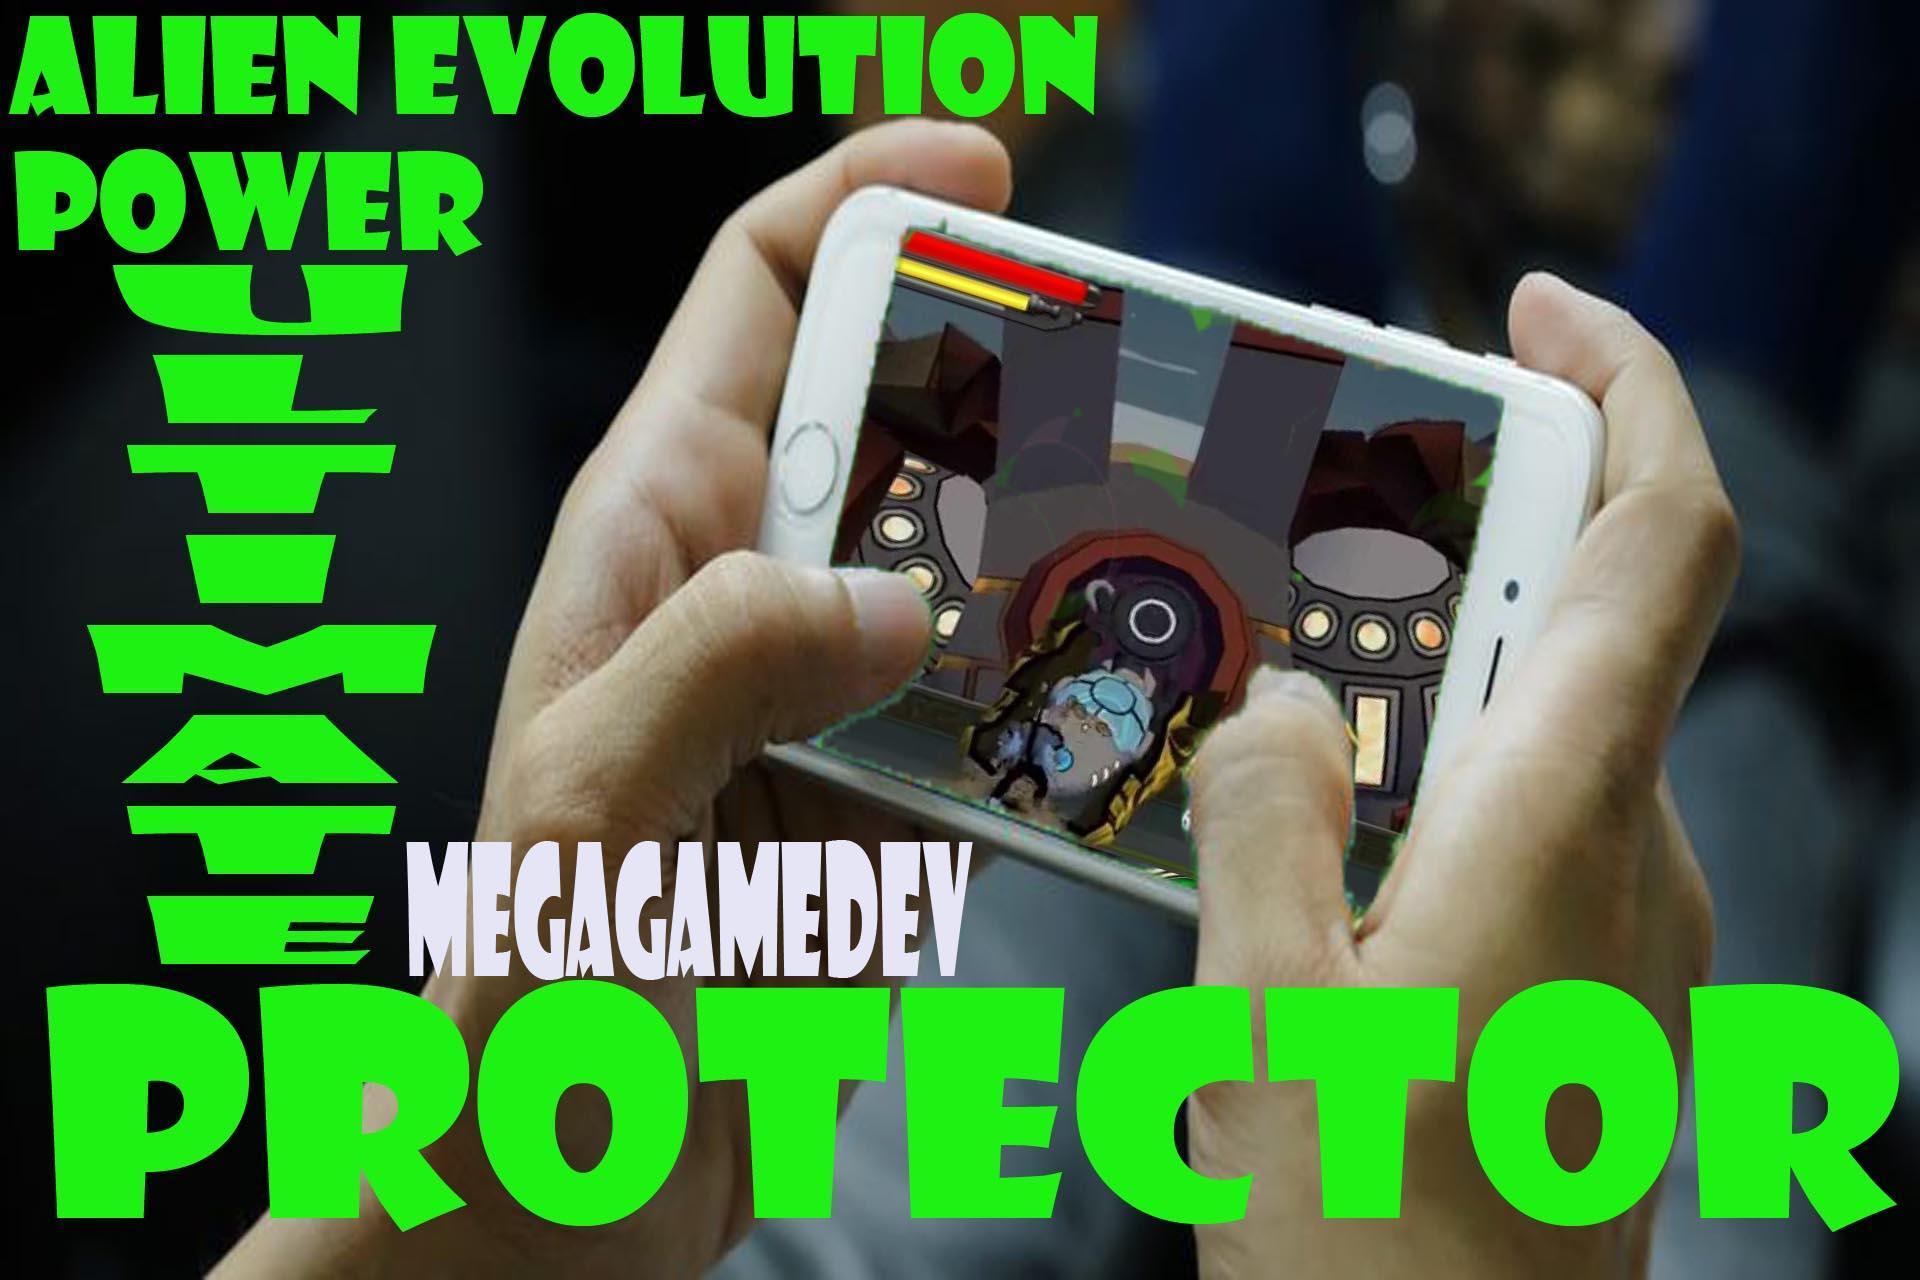 Alien Evolution : Power Ultimate 10 Protector 4.c Screenshot 3